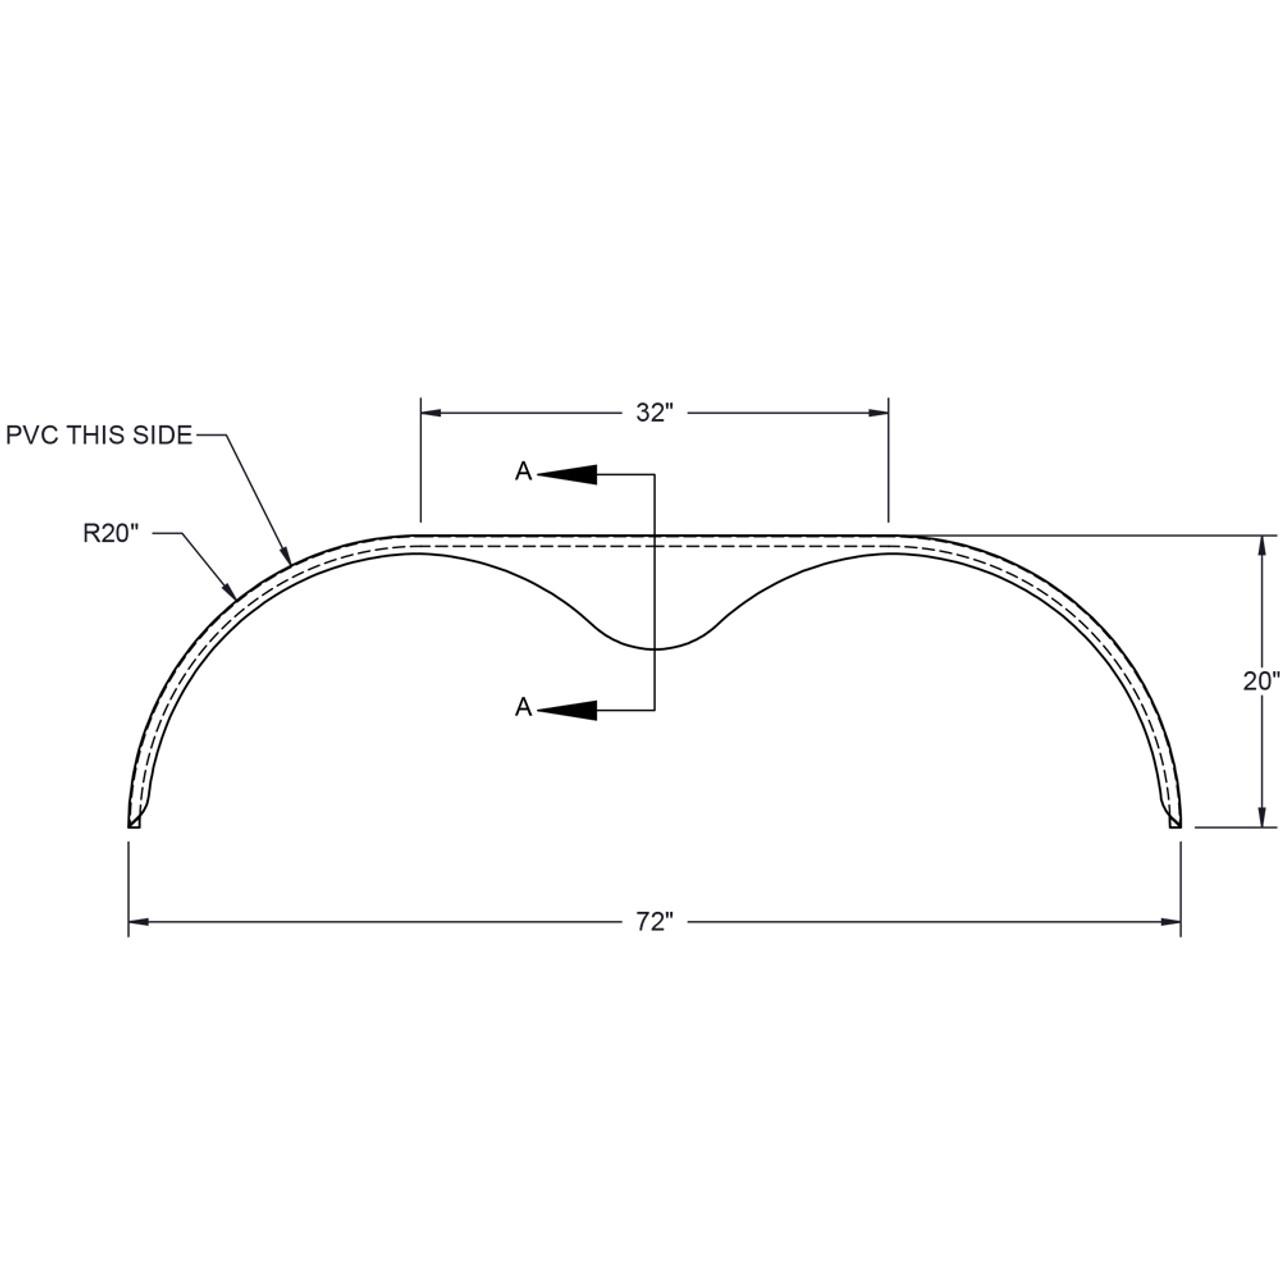 72x9 Tandem Axle Teardrop 16-Gauge Steel Trailer Fender - One Fender